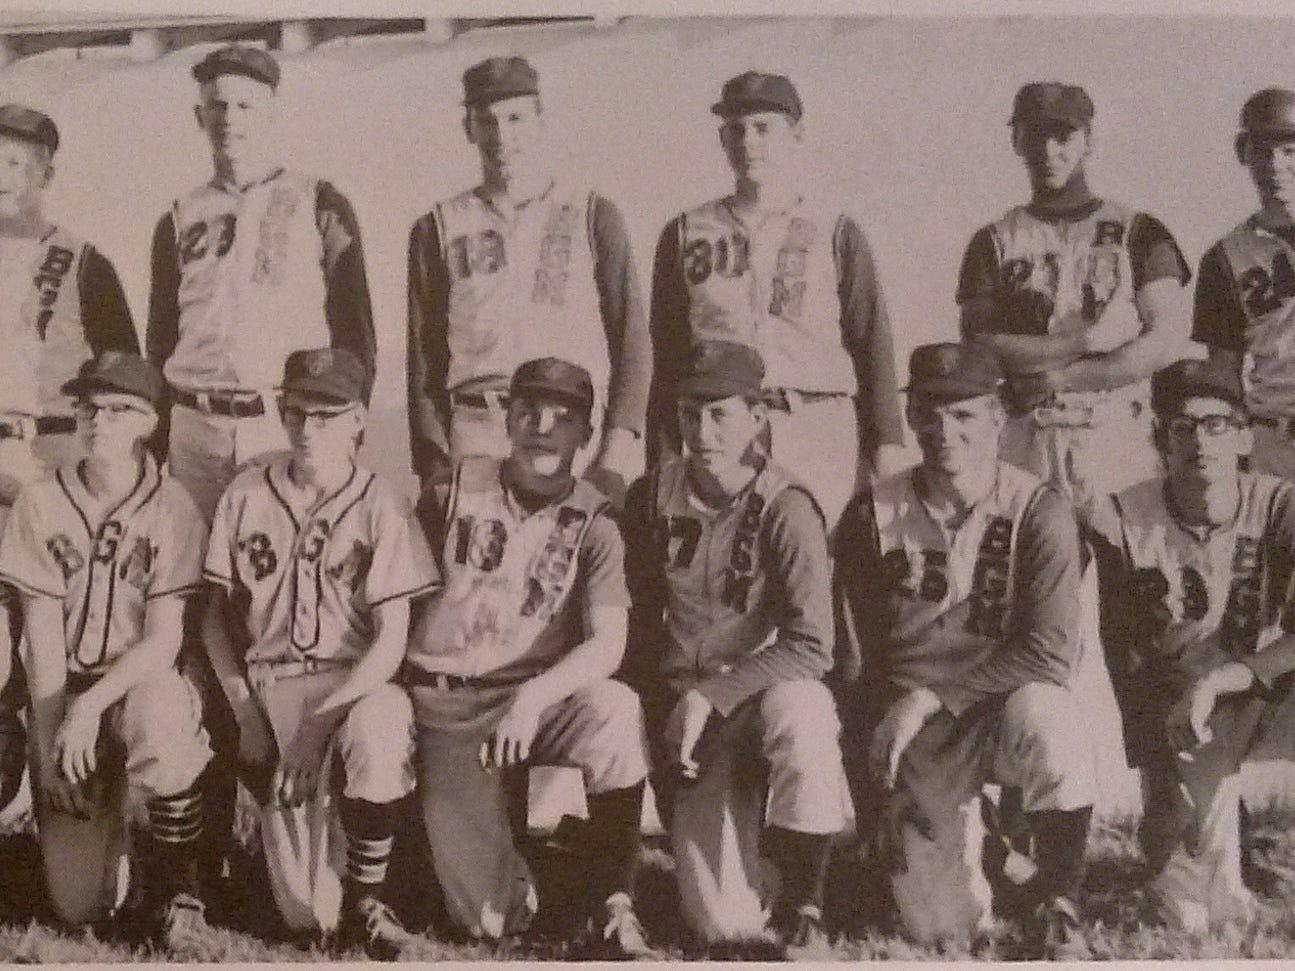 The 1969 BGM baseball team included: Front row from left, Dennis Purdy, John Lippincott, Gene Rhinehart, Dave Jermier, Donn Stone, Dave Kloock, Ben Walter, John Morton and Robert Drake. Second row, Head Coach James Barr, Harold Whitsell, Gary Cleppe, Dennis McCulla, Dave McCulla, Jim Schwiebert, Jim Nervig, Pat Akery and Mark Walford.